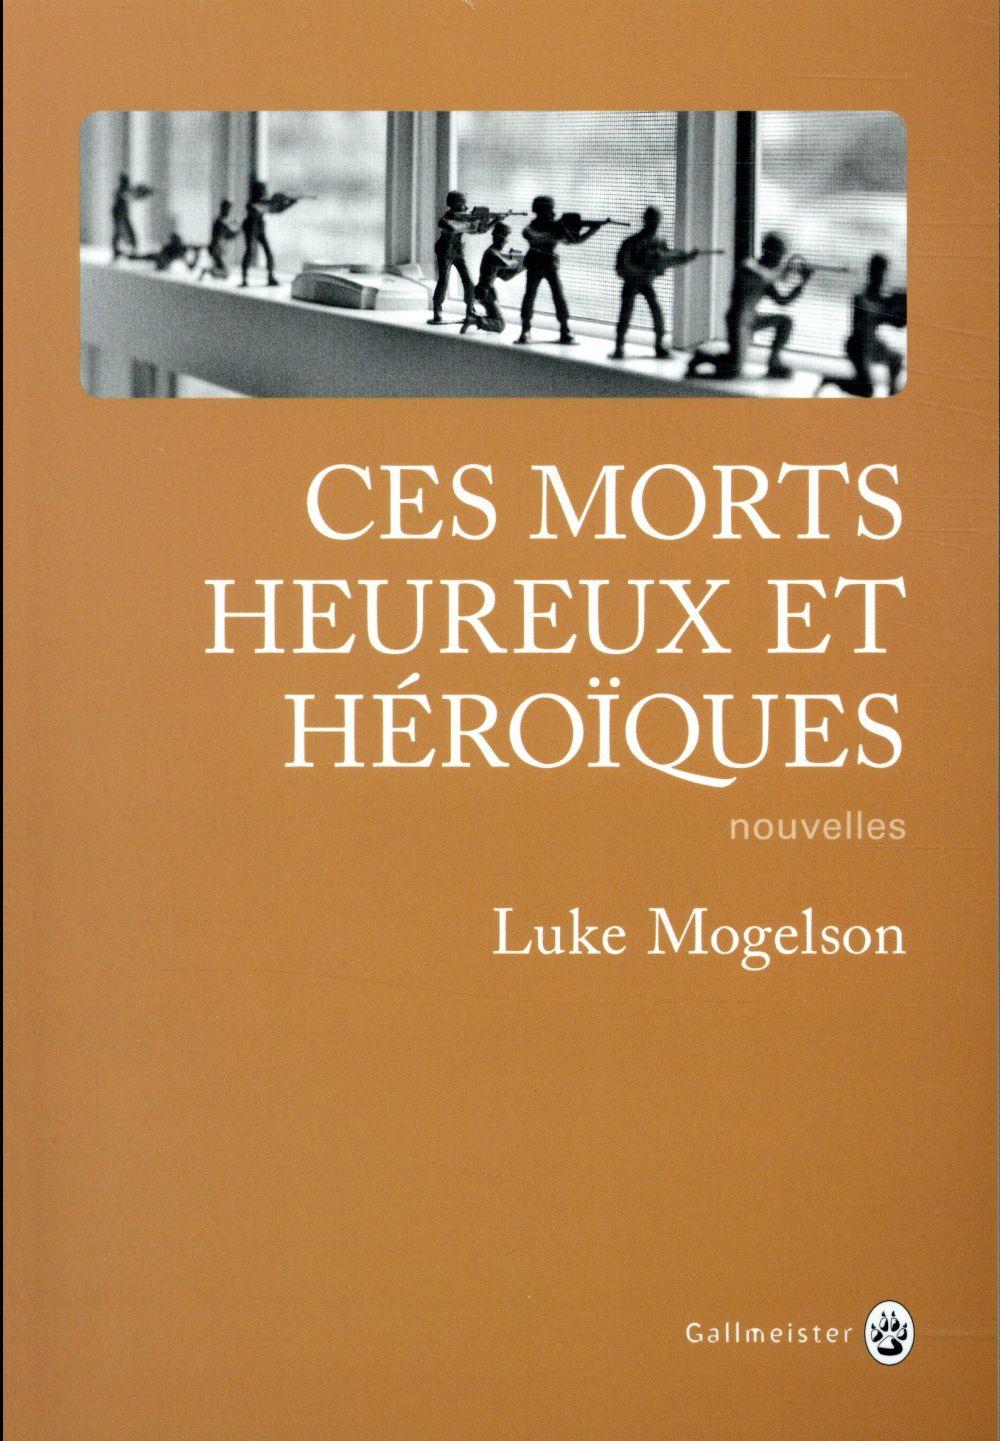 CES MORTS HEUREUX ET HEROIQUES MOGELSON LUKE GALLMEISTER